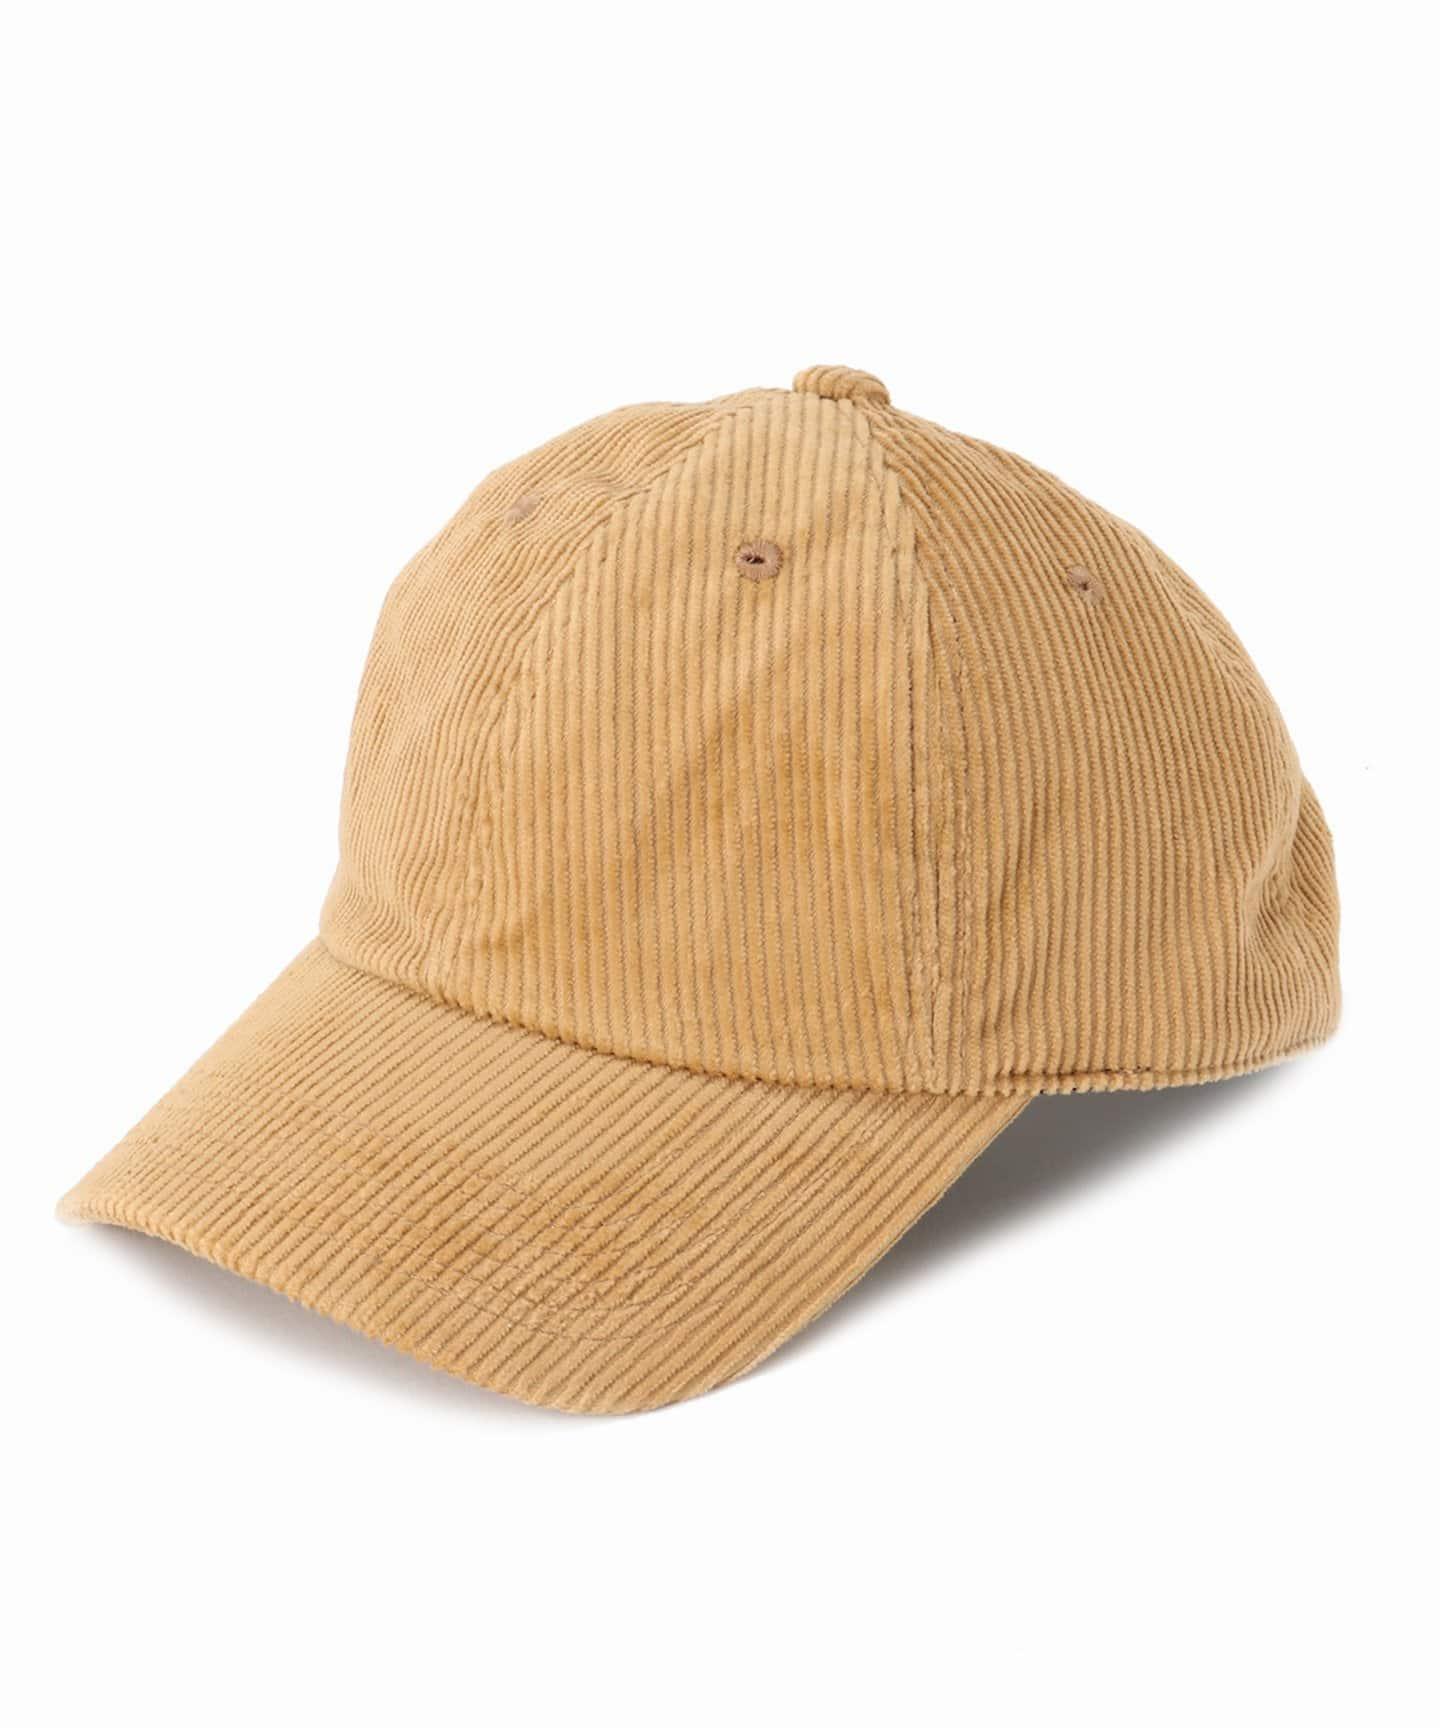 B.C STOCKの帽子/キャップ|キャメル